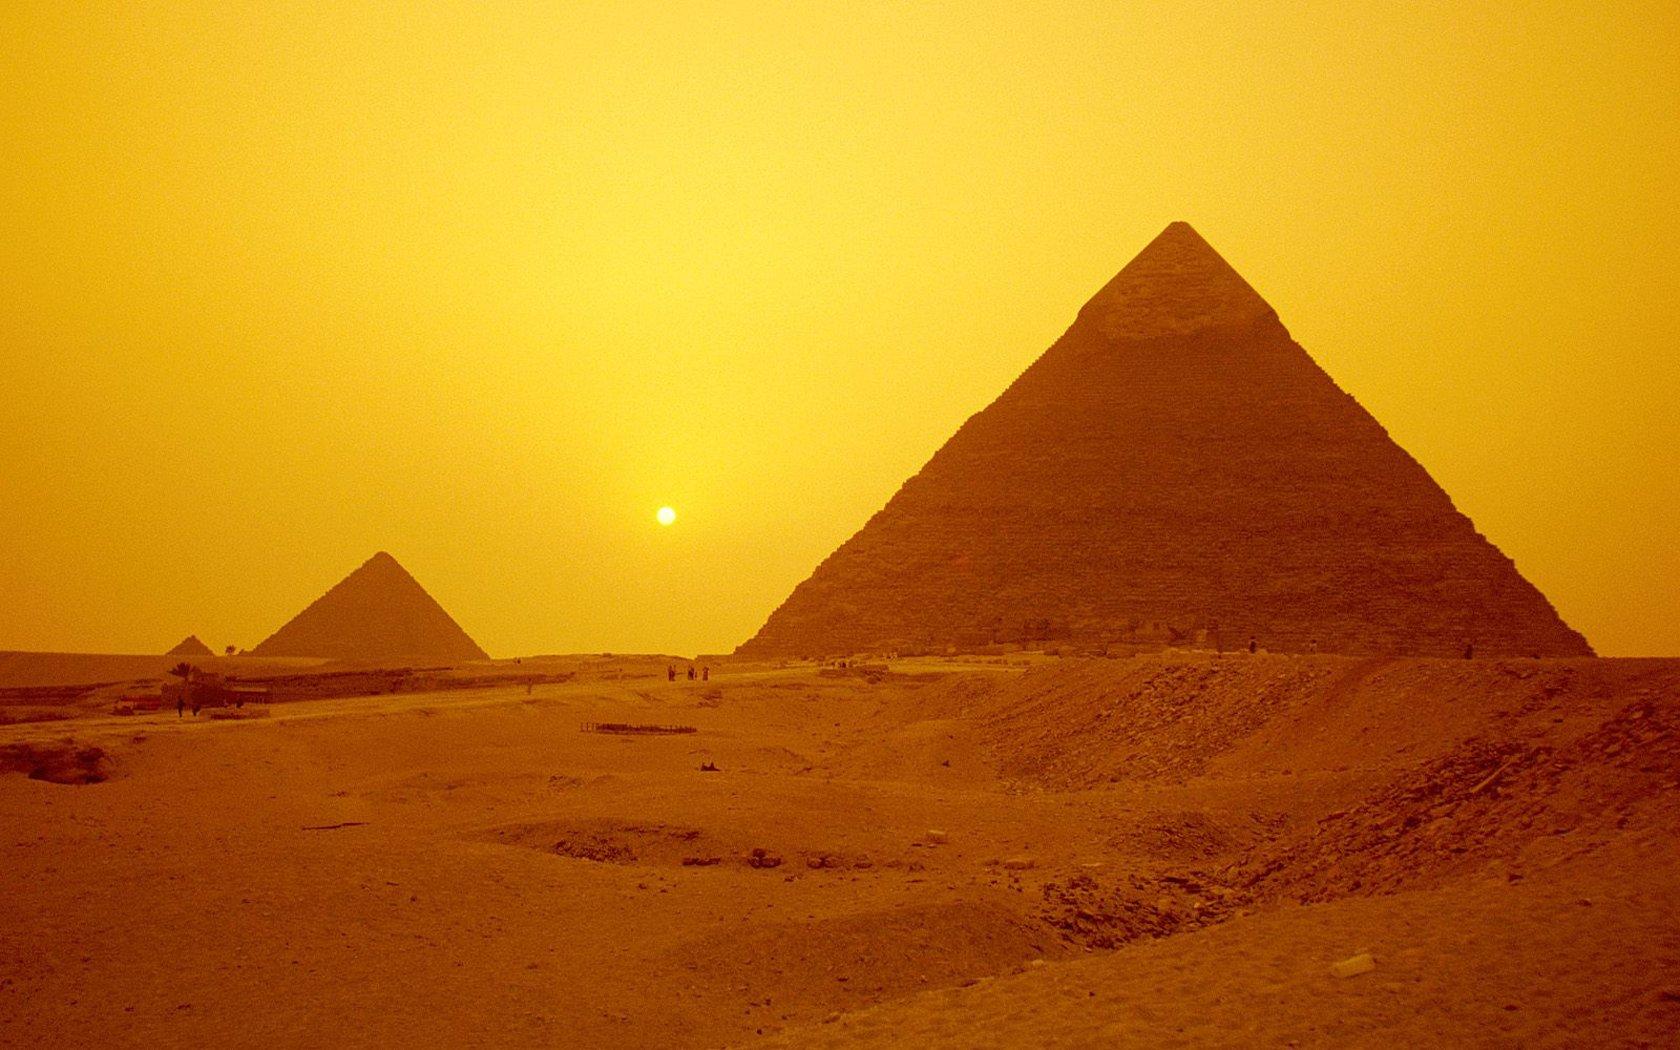 pyramids giza egypt backgrounds wallpapersjpg 1680x1050